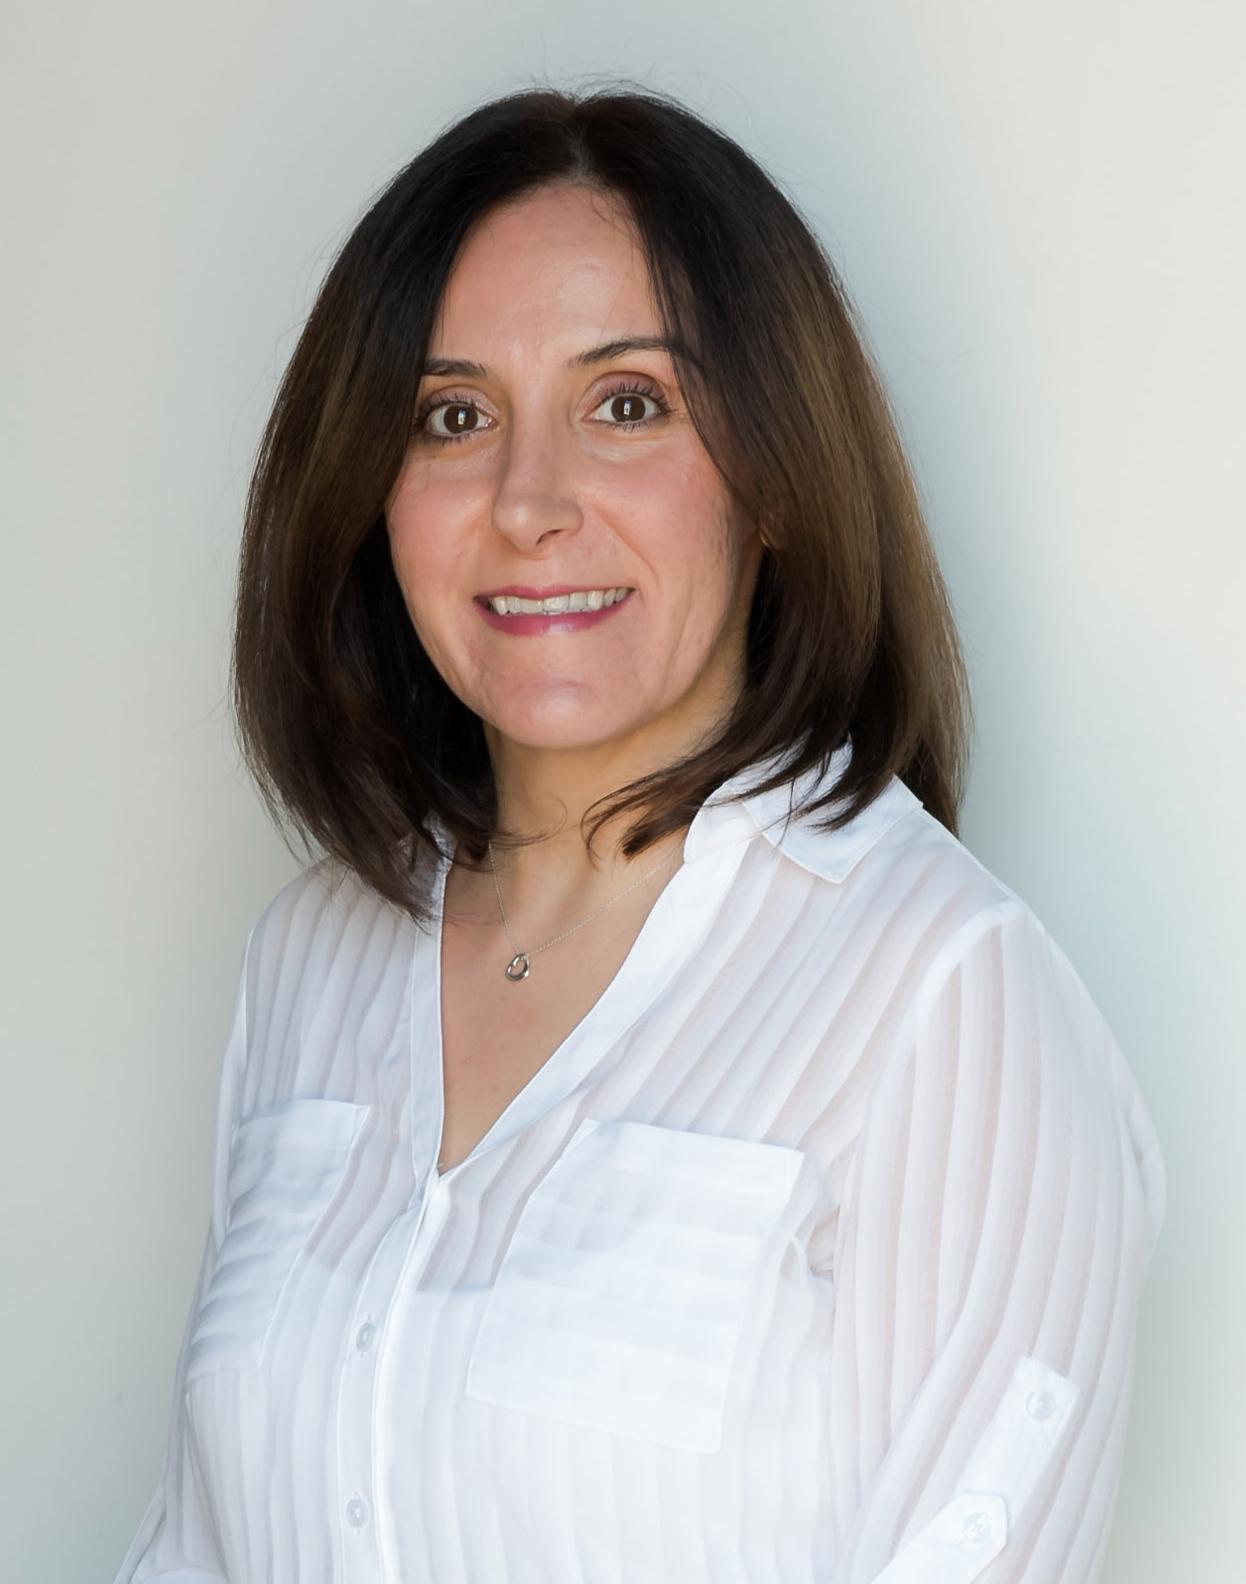 Melineh Zomorrodian